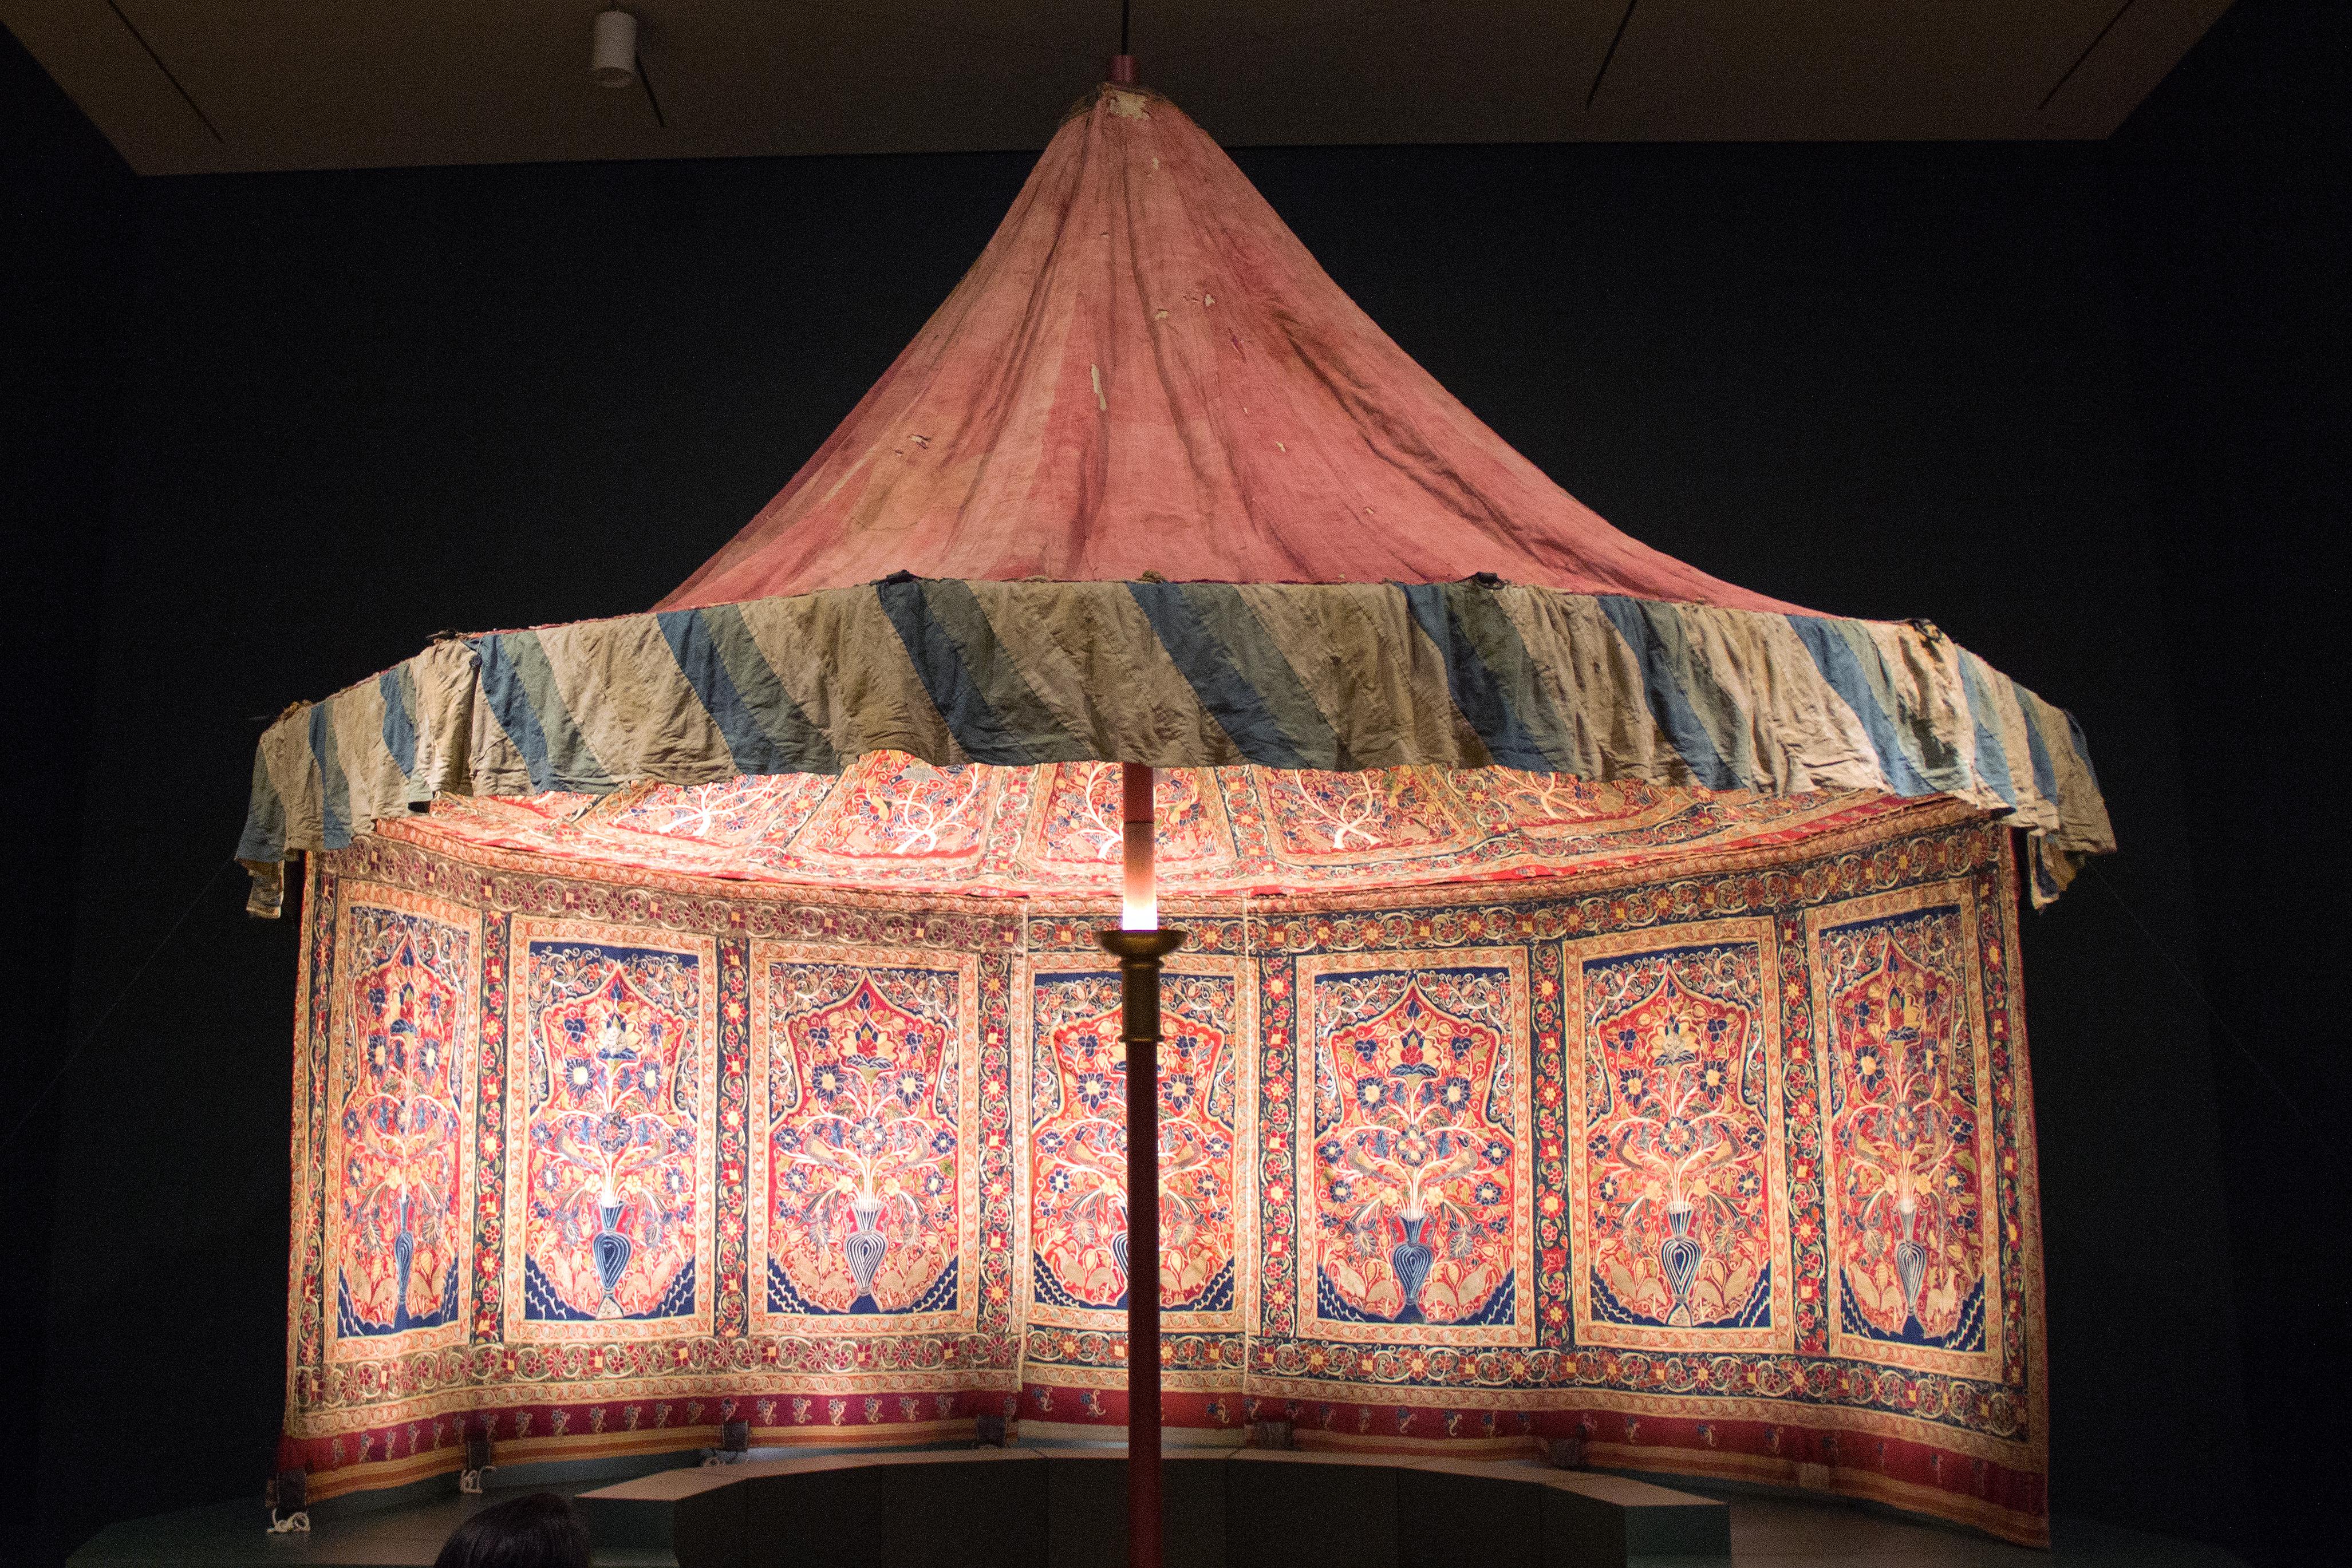 & At the Museum: Muhammad Shahu0027s Royal Persian Tent   Urban Explorer